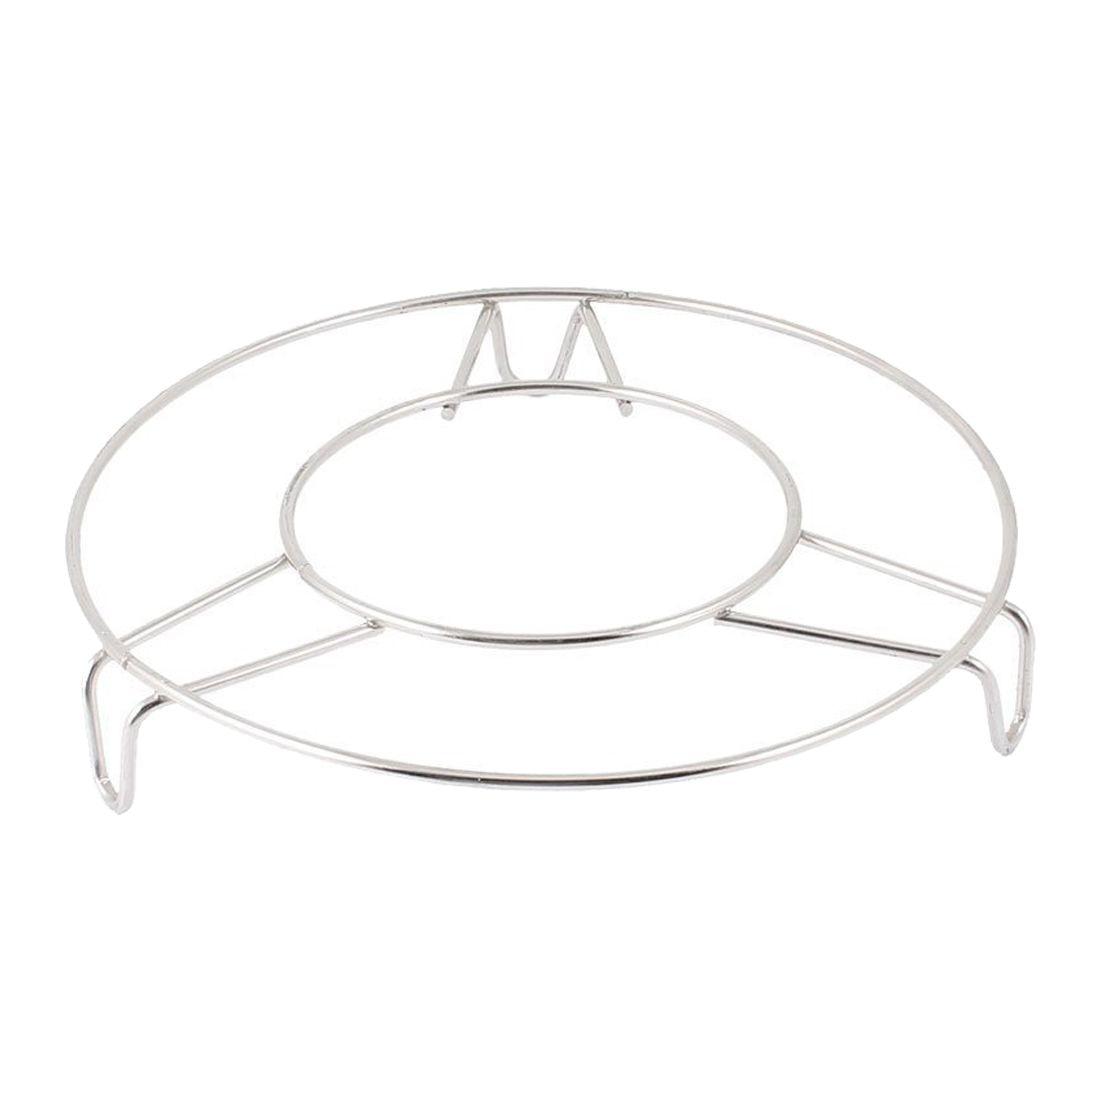 FJS-Stainless Steel Round Steamer Rack Stand 6 Inch Diameter 2 Pcs